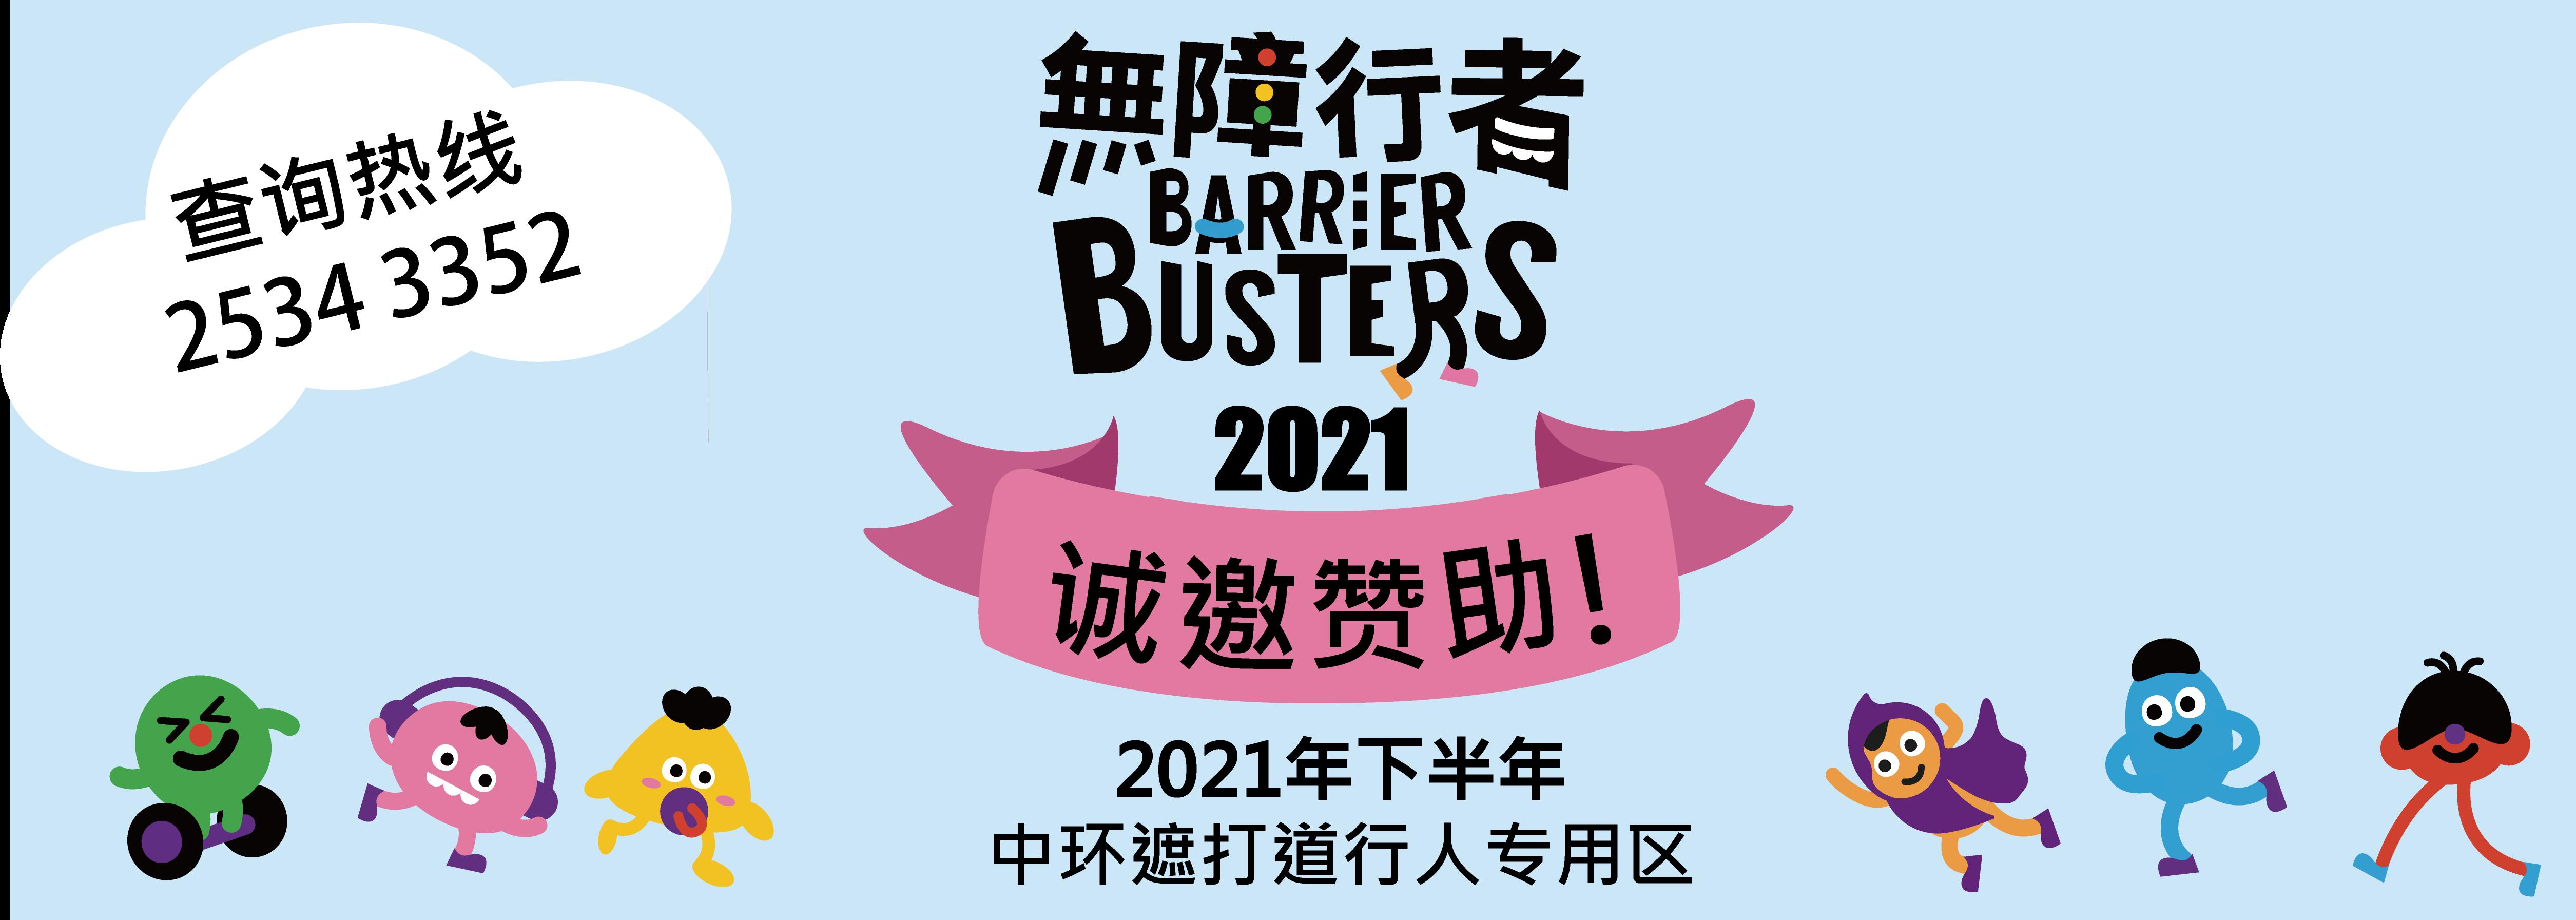 BB2021 Banner Sponsorship Sim